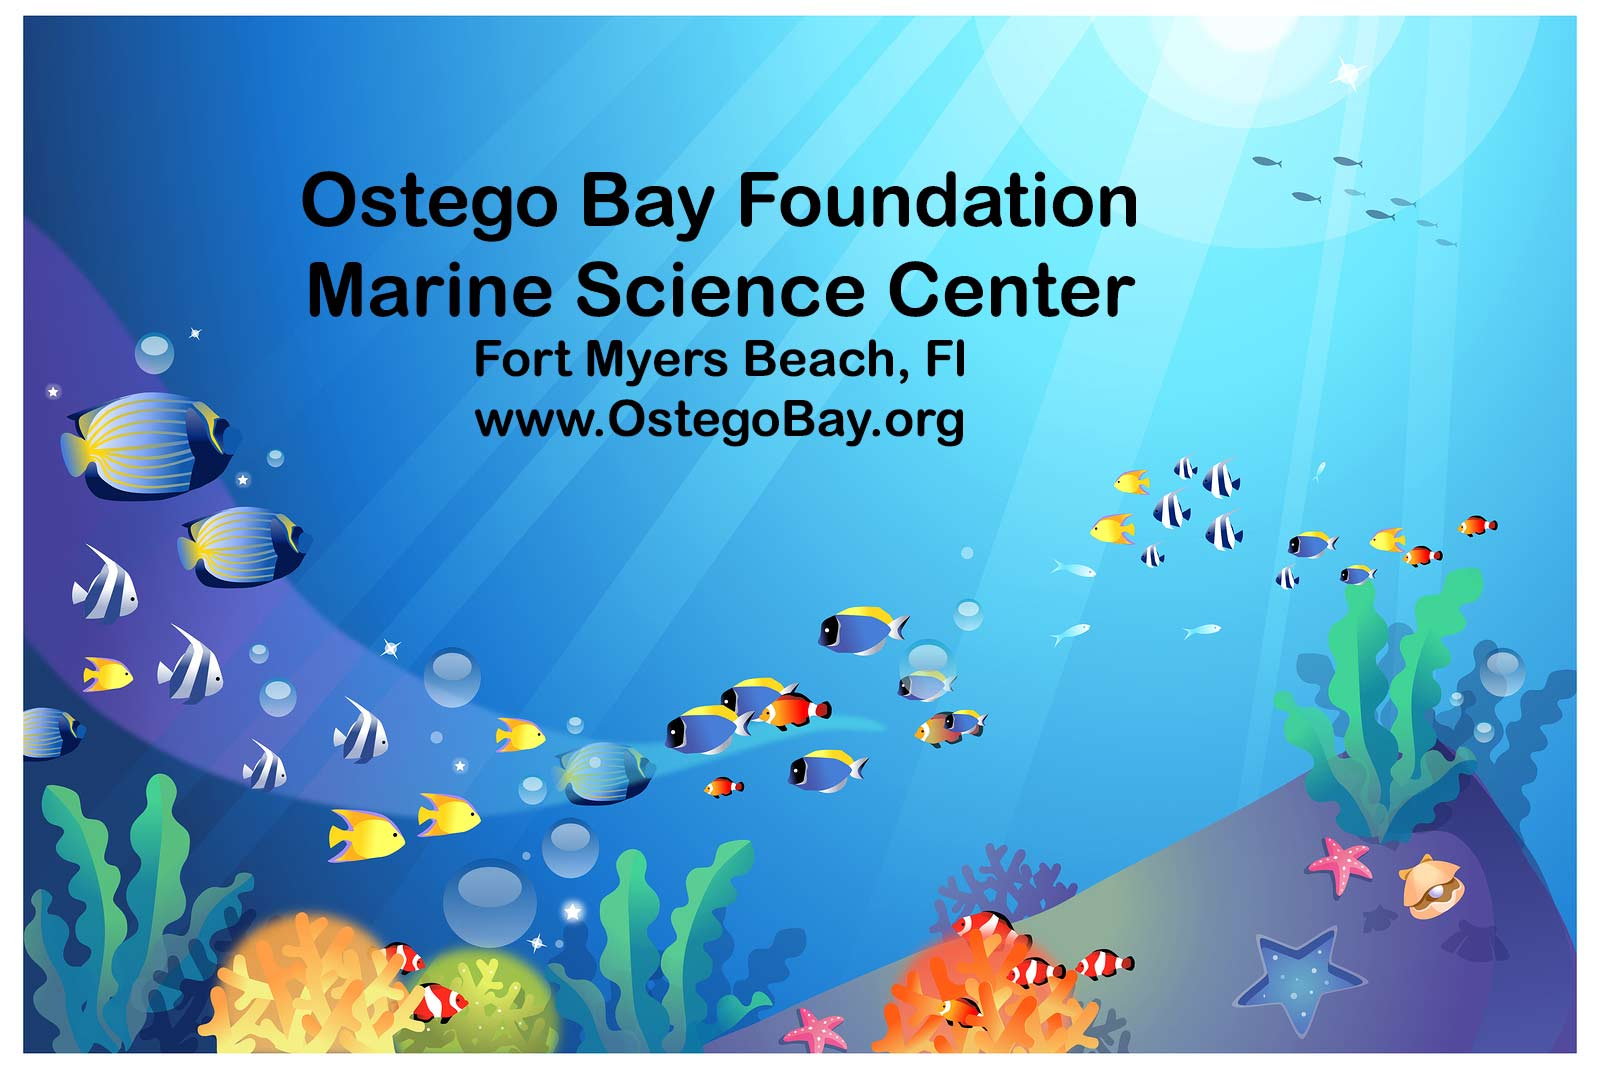 Ostego Bay Marine Science Center Fort Myers Beach